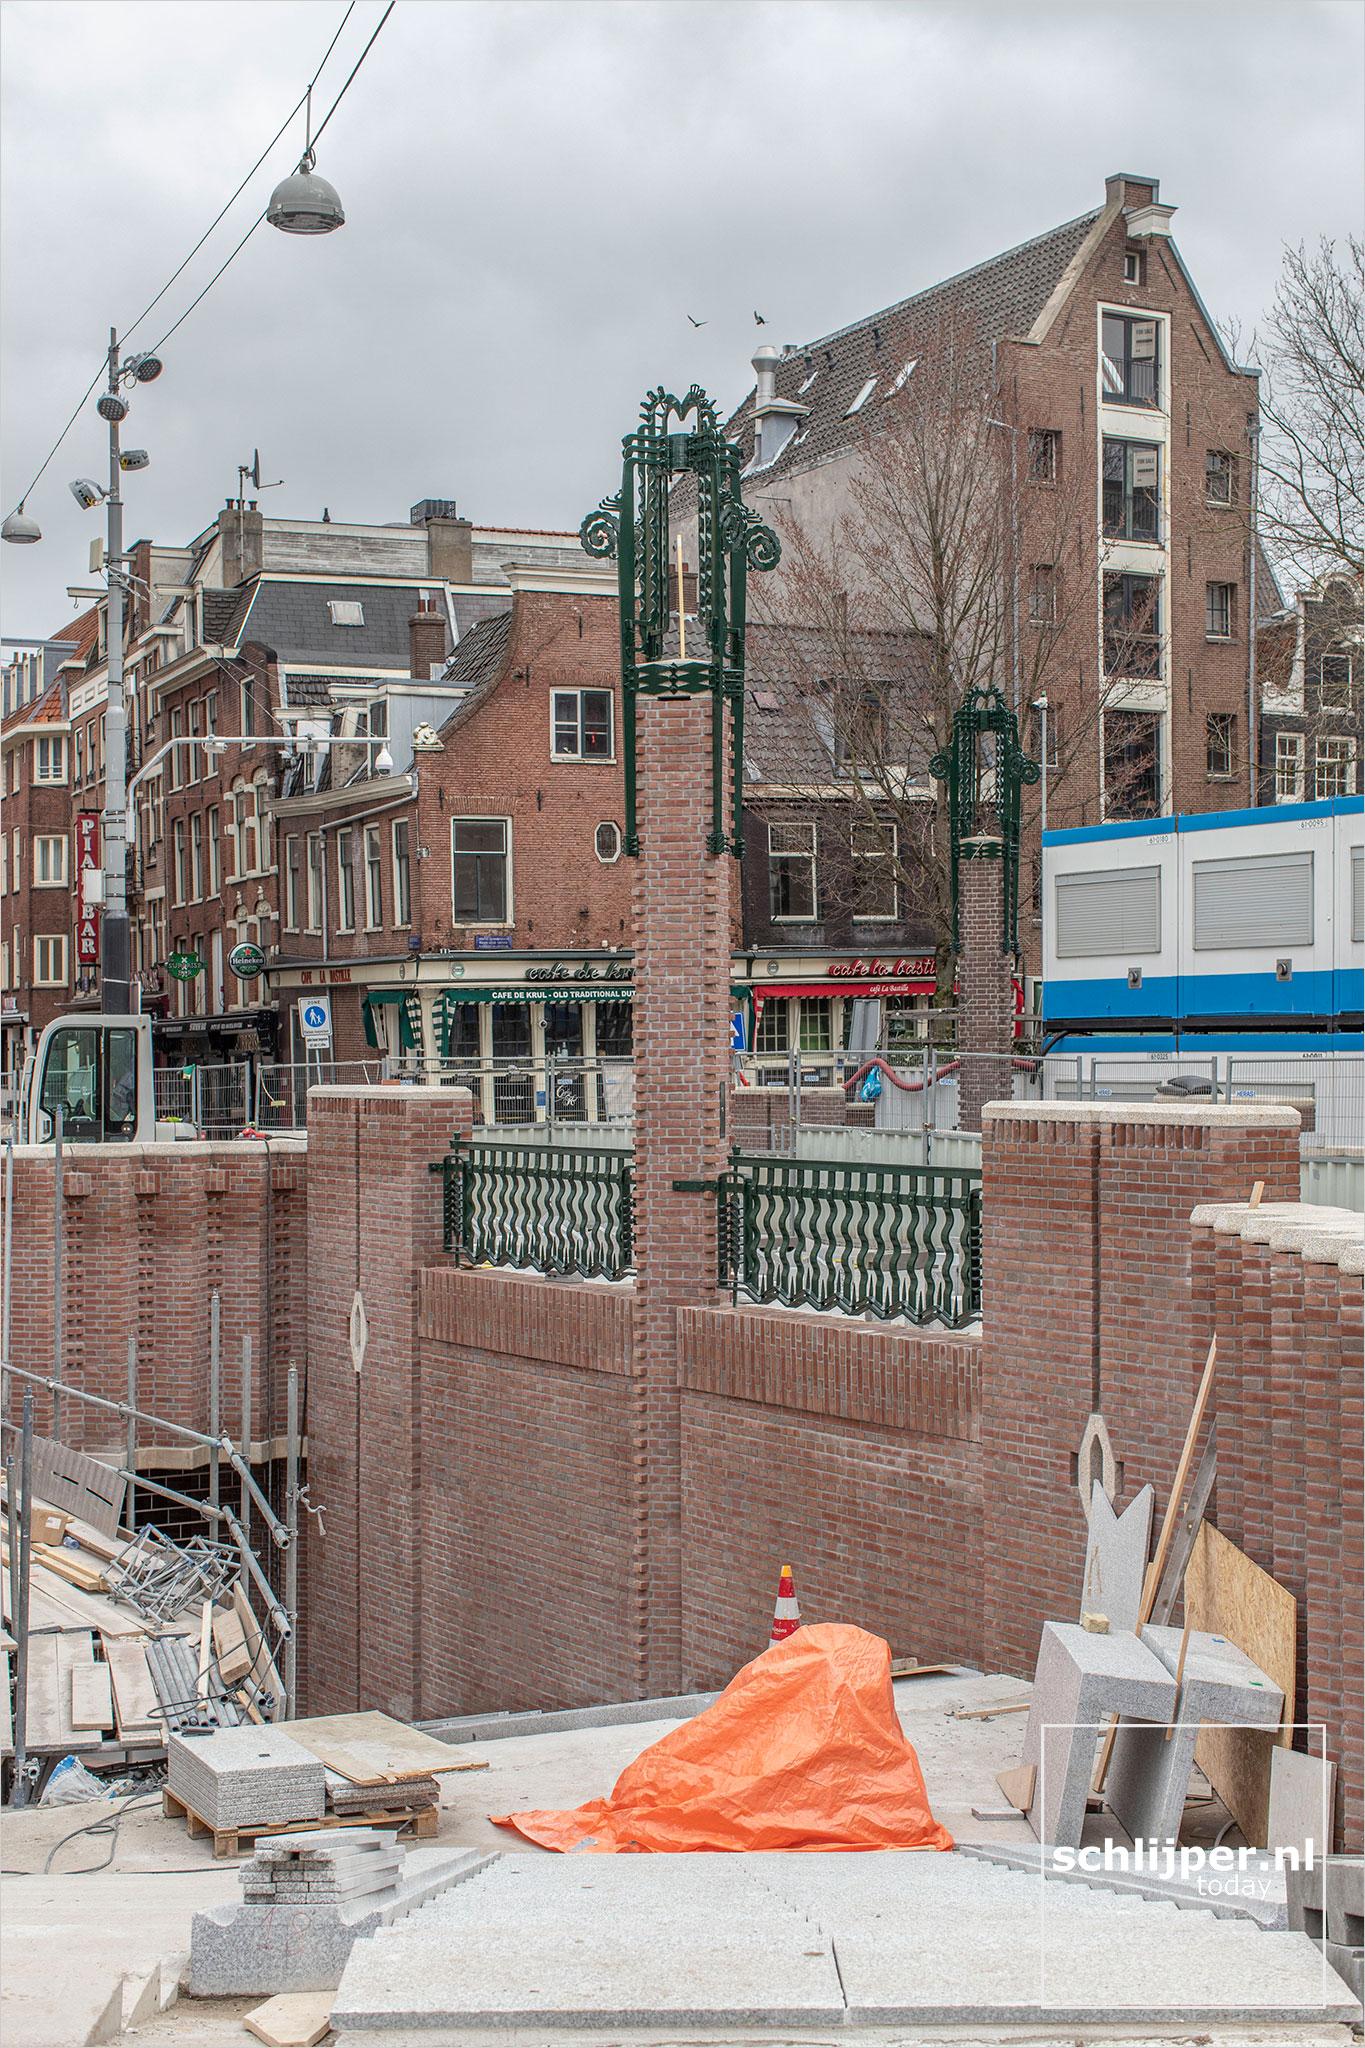 The Netherlands, Amsterdam, 21 maart 2021